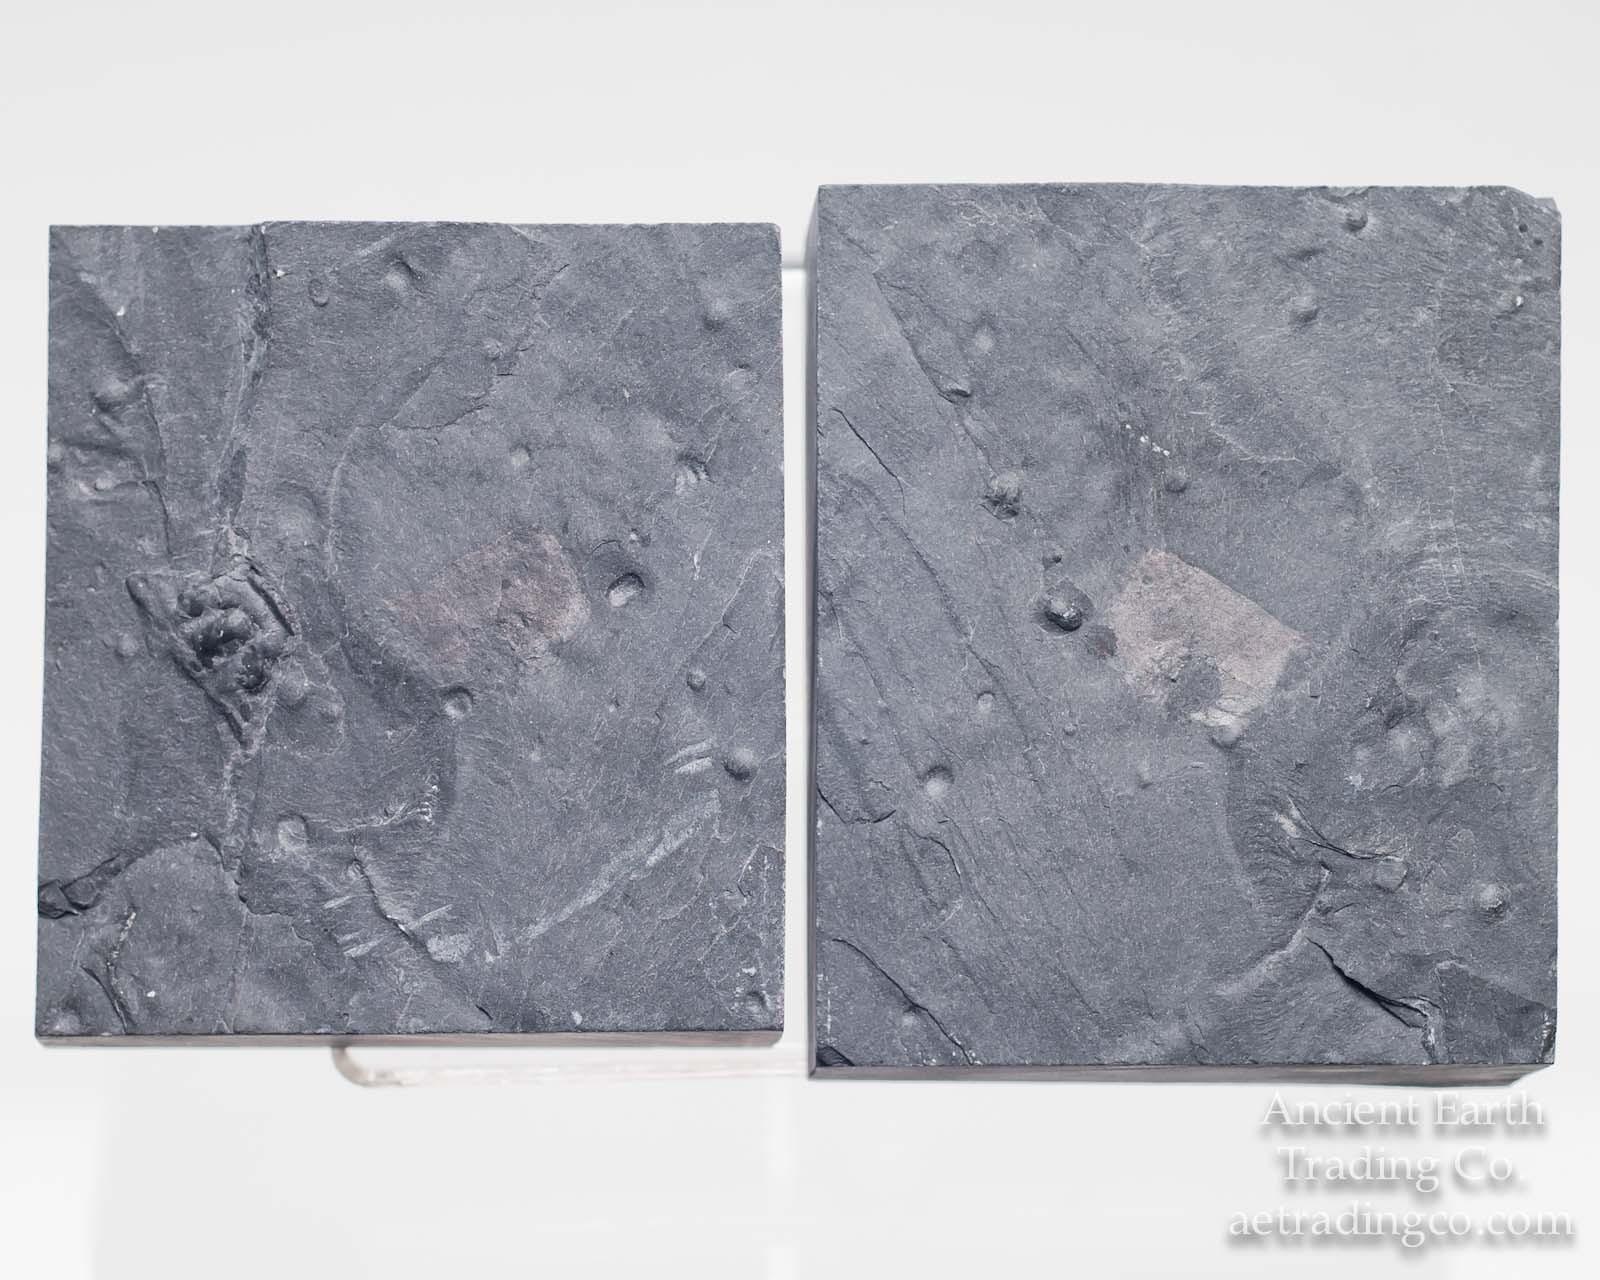 Phyllocarid (Dicerocaris) with Pos/Neg Halves from Utah